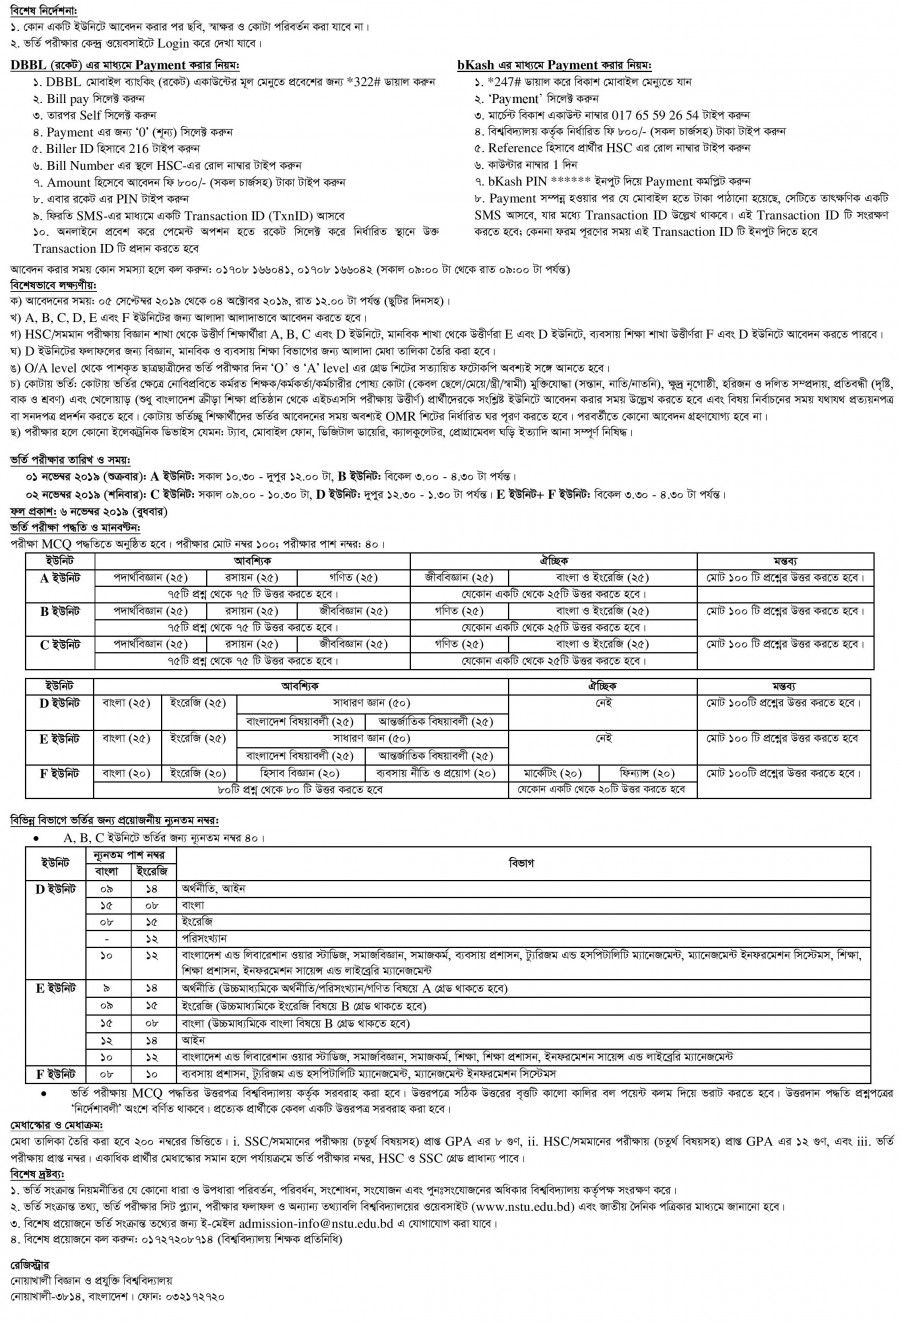 Nstu Admission Result 2019 Admit Card Seat Plan Result